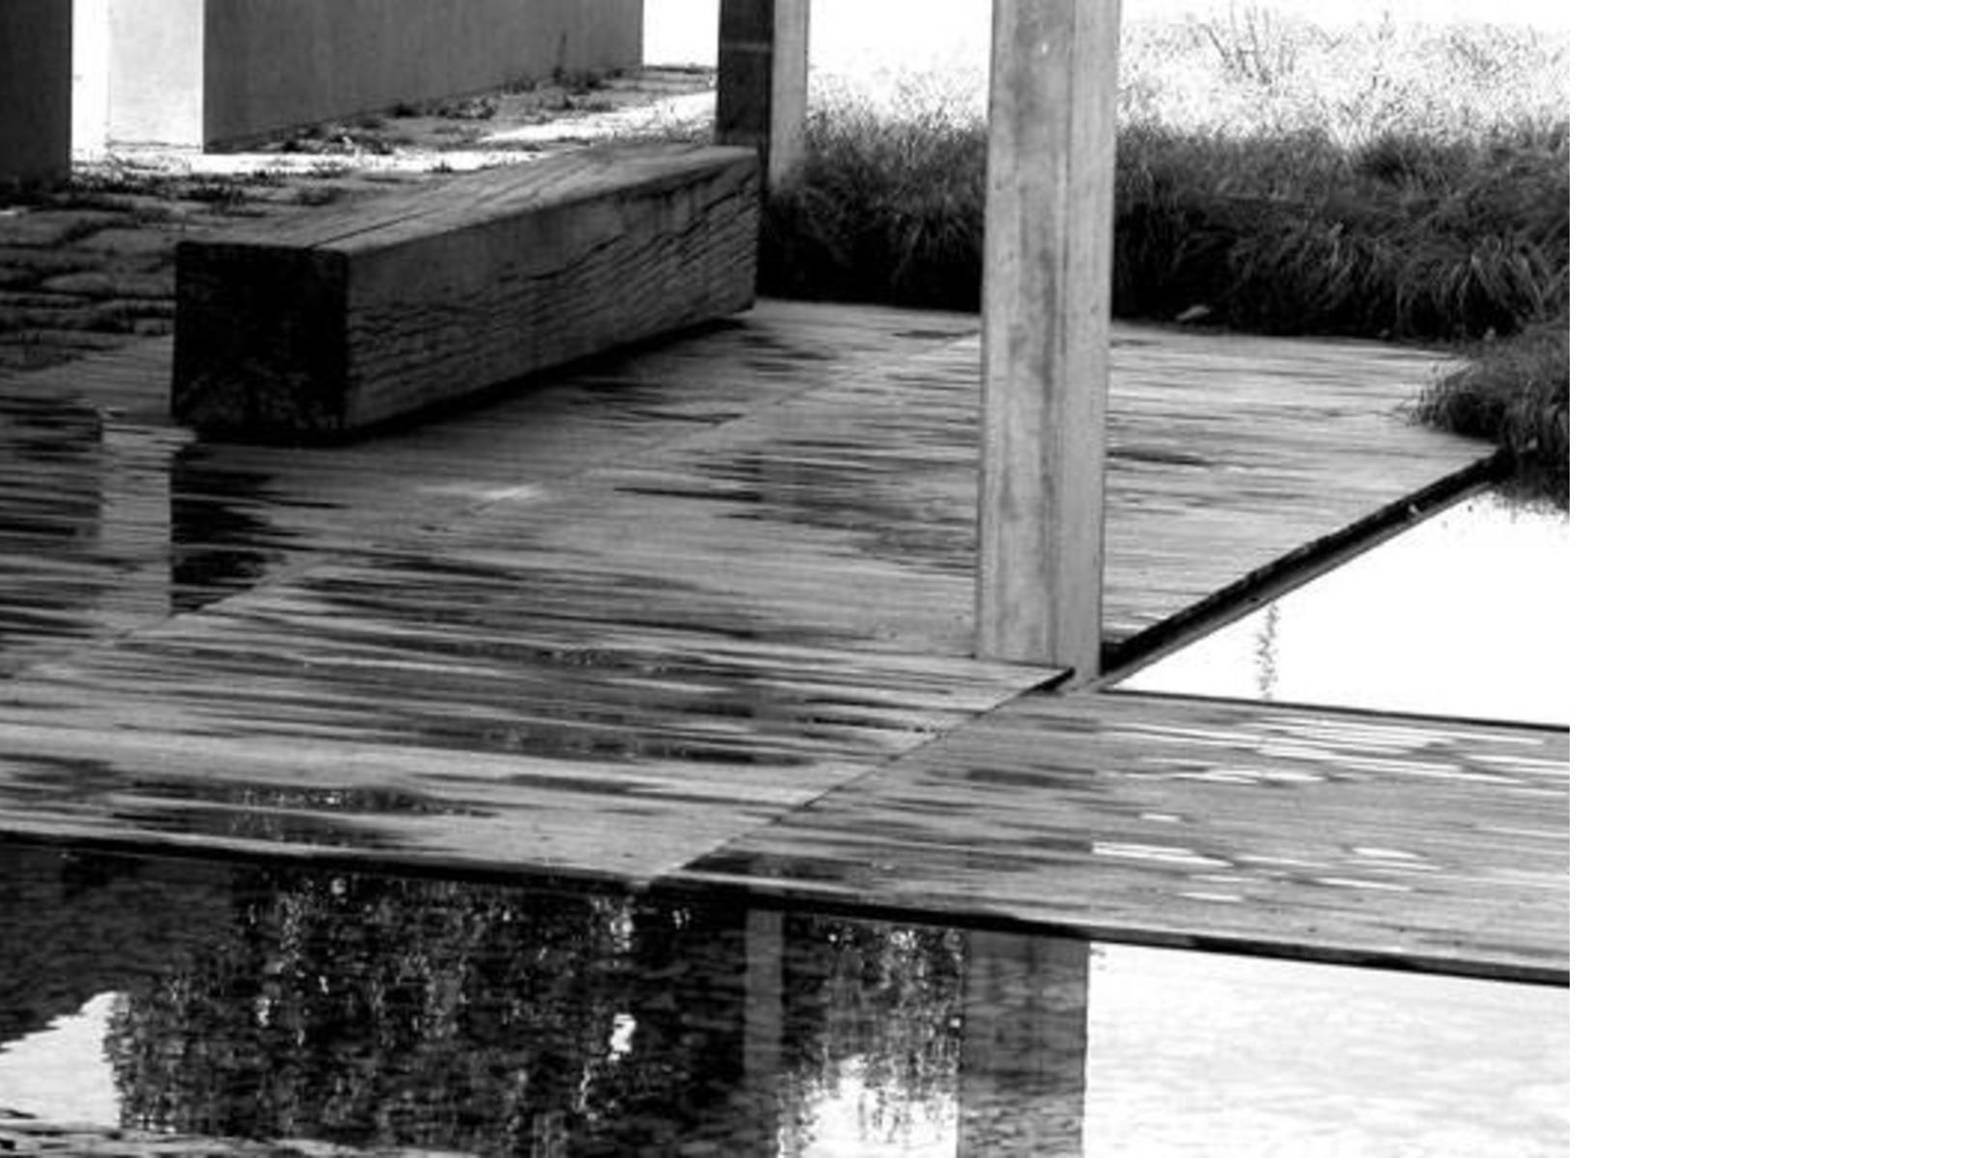 Giardino Zen Architettura : Architettura matassoni giardino ed uffici bigi floornature